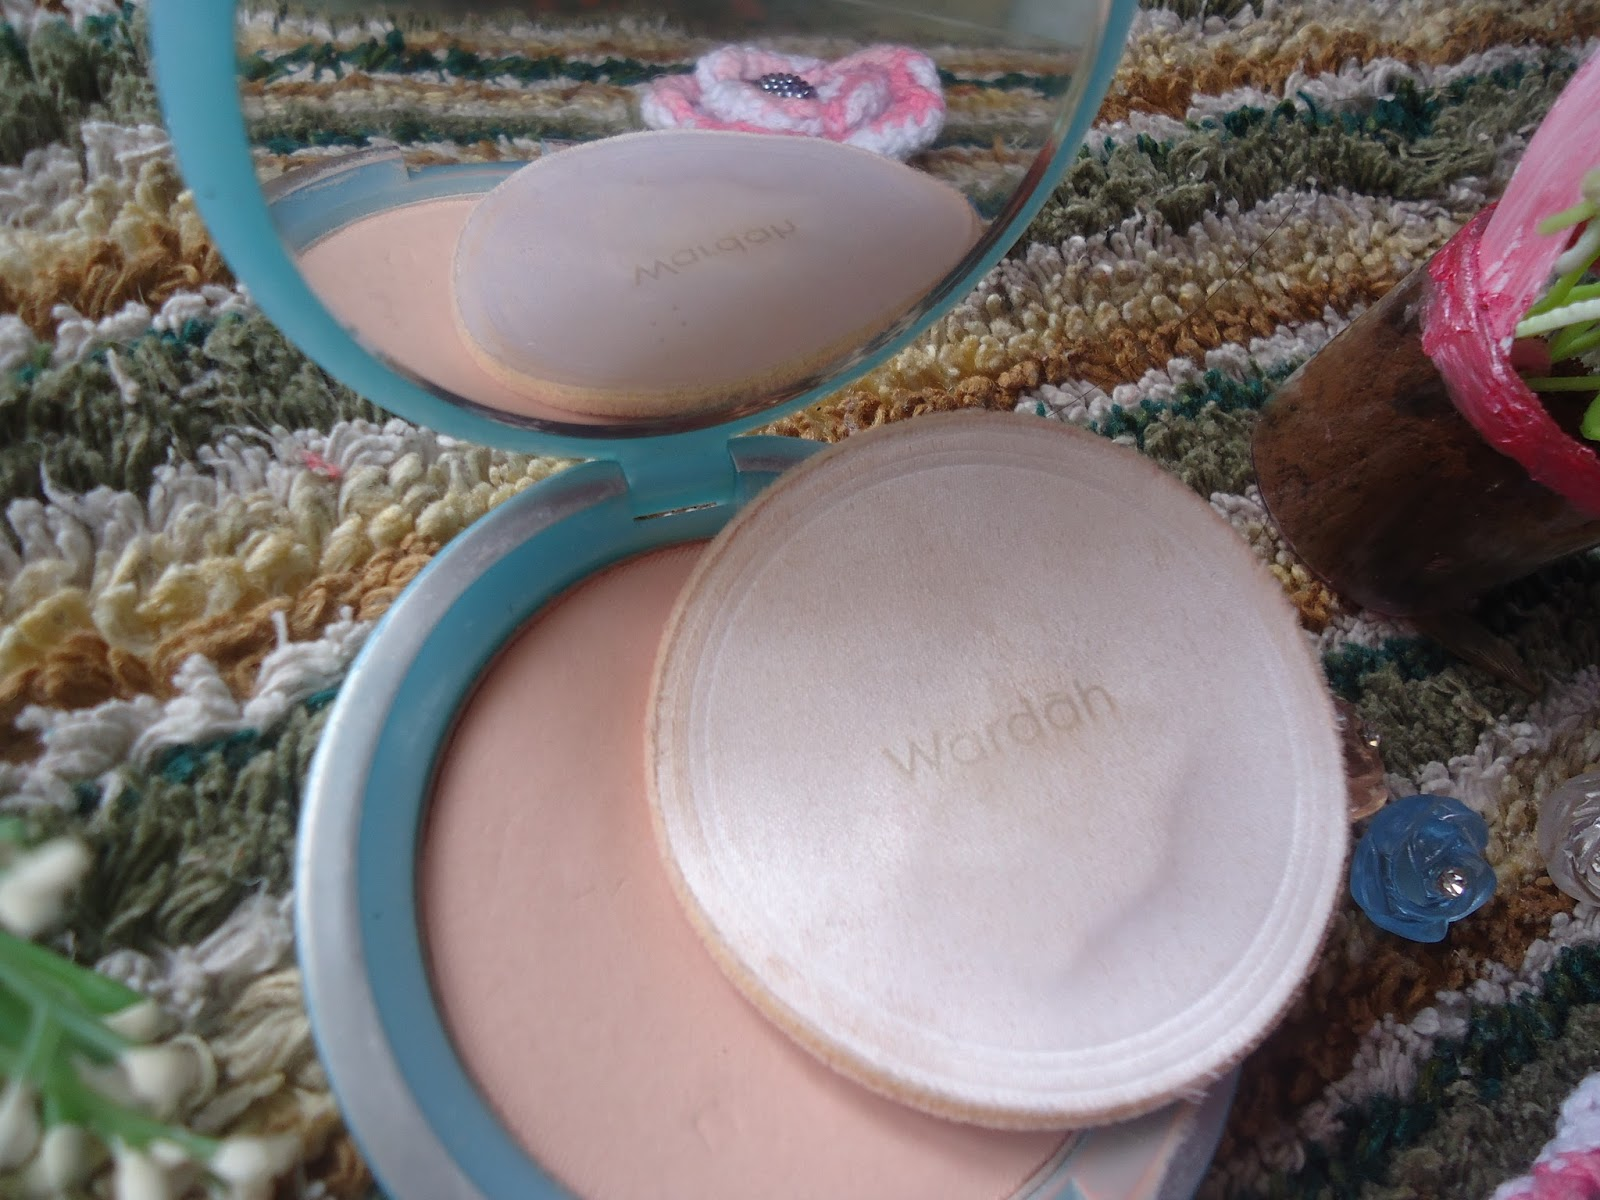 uli mayang: Review, Wardah compact powder 01 Light Beige